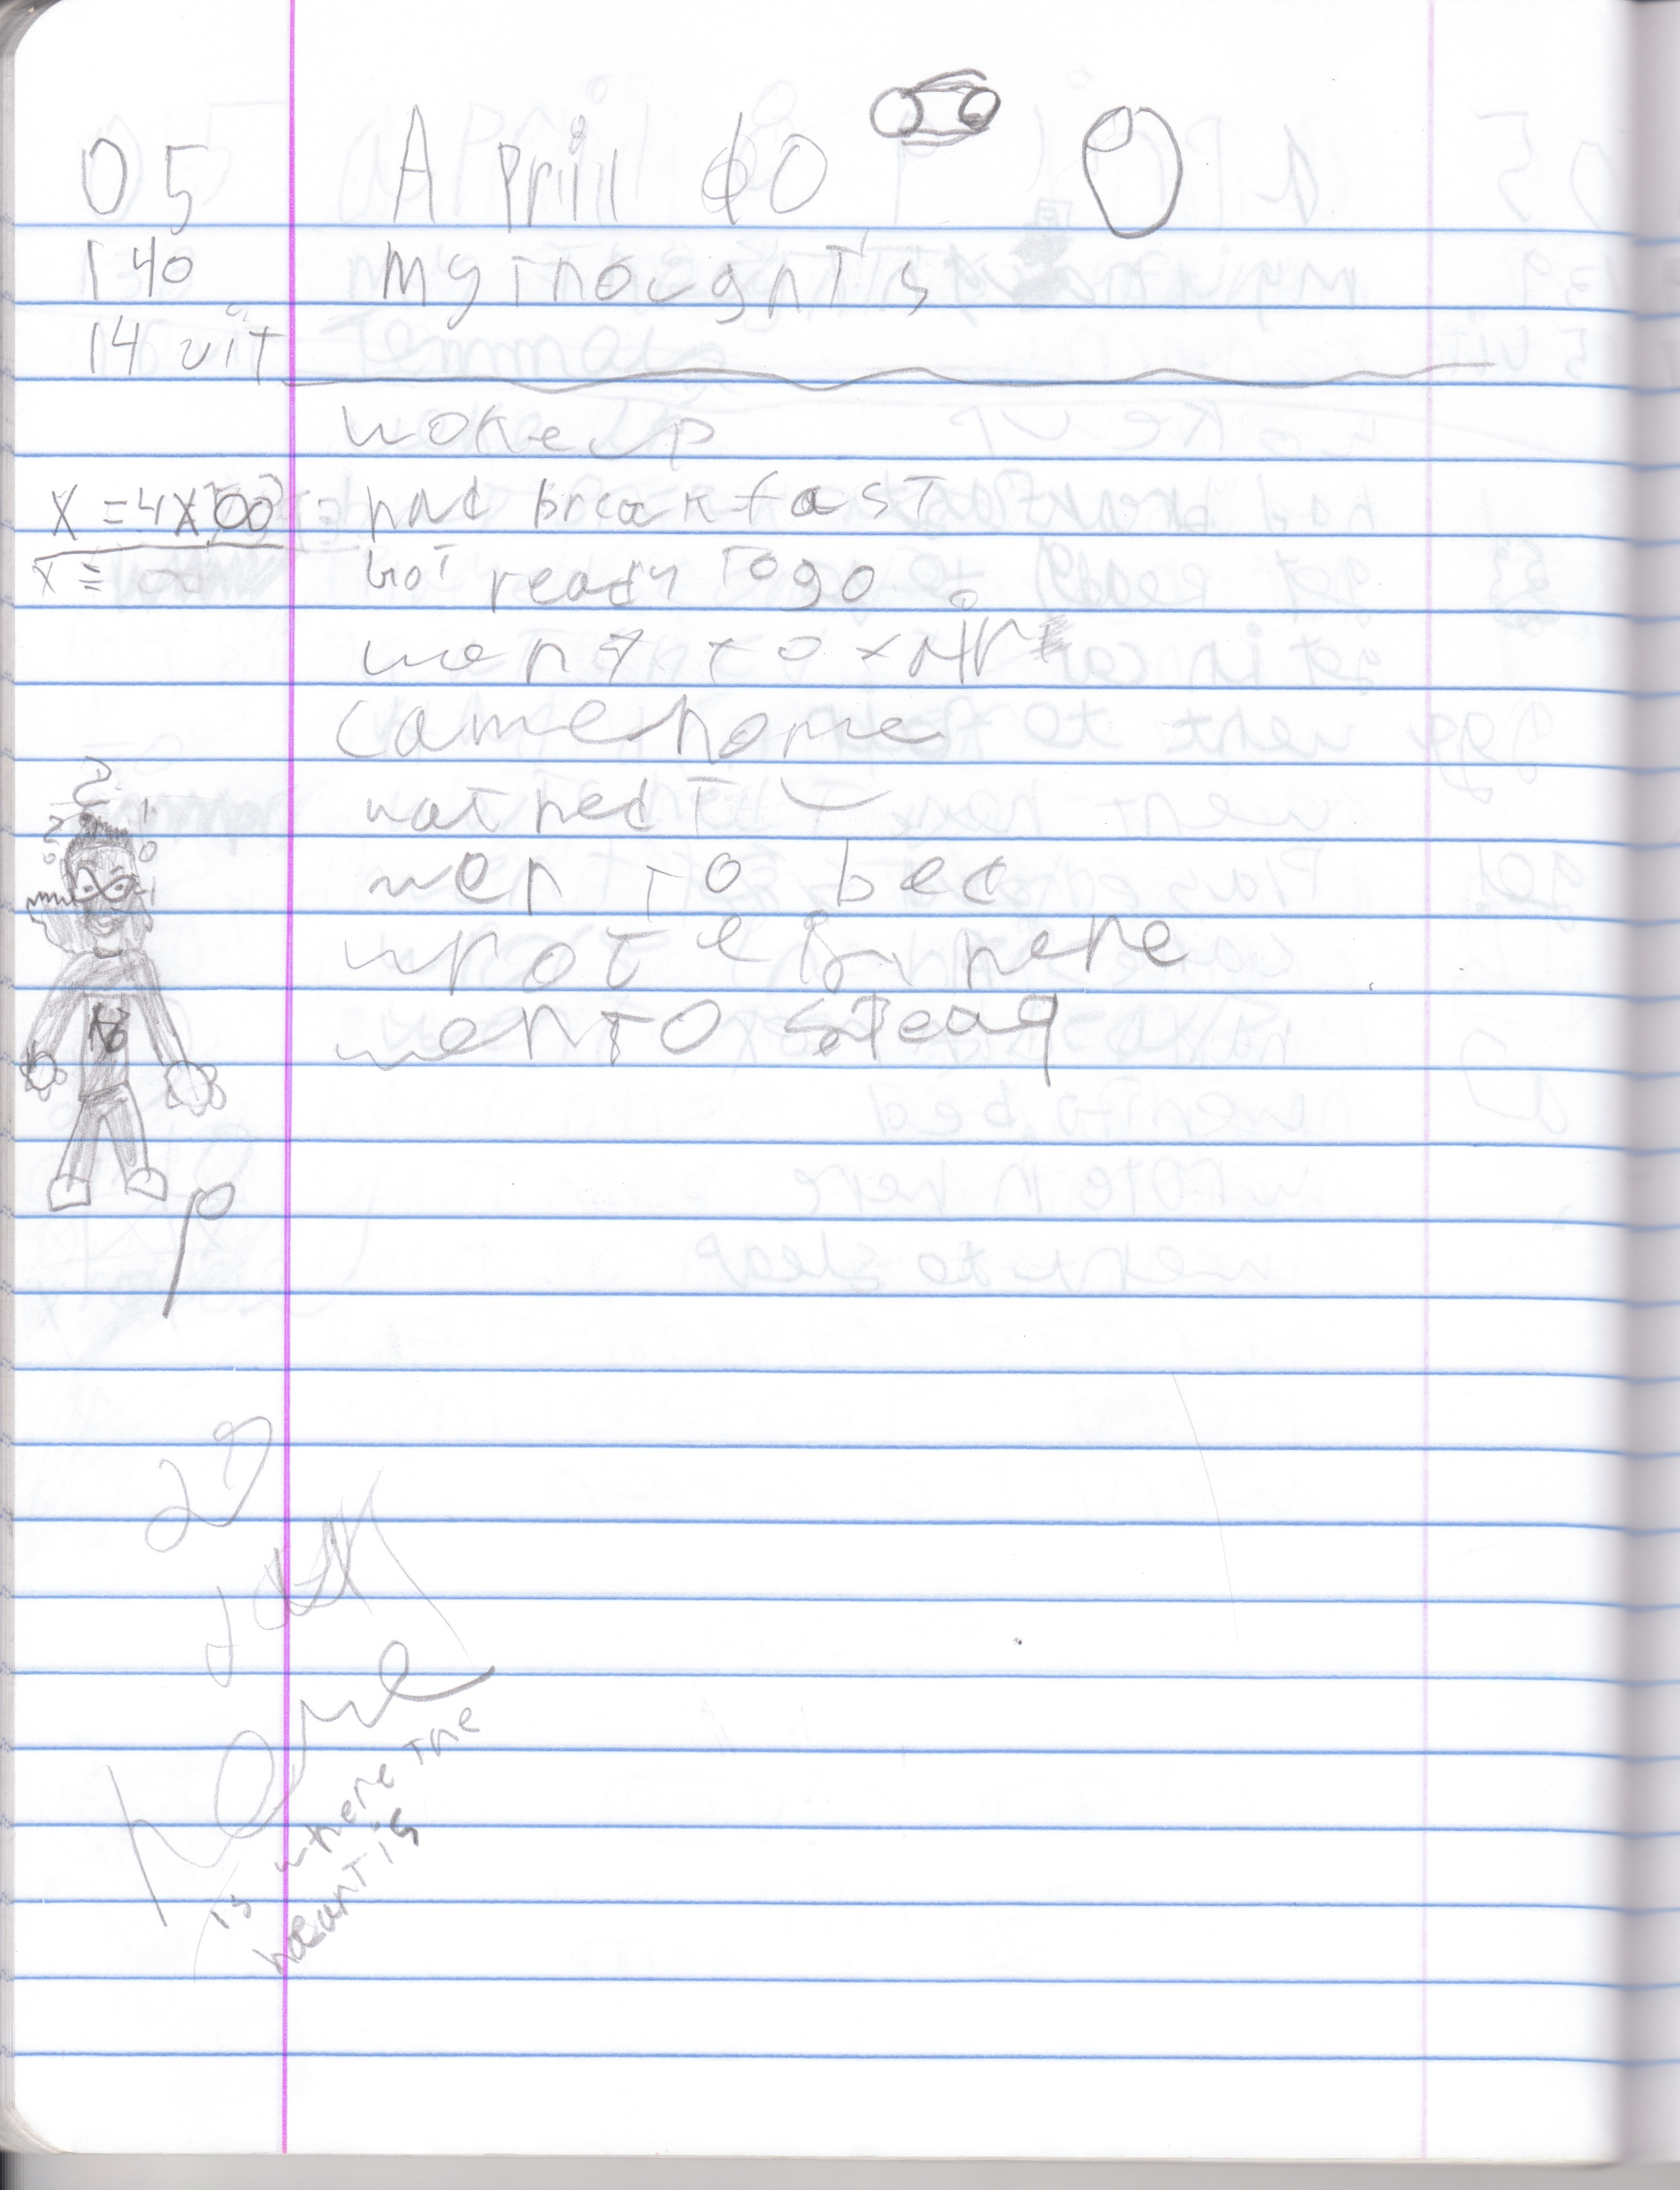 my first diary-log_Page_182.jpg